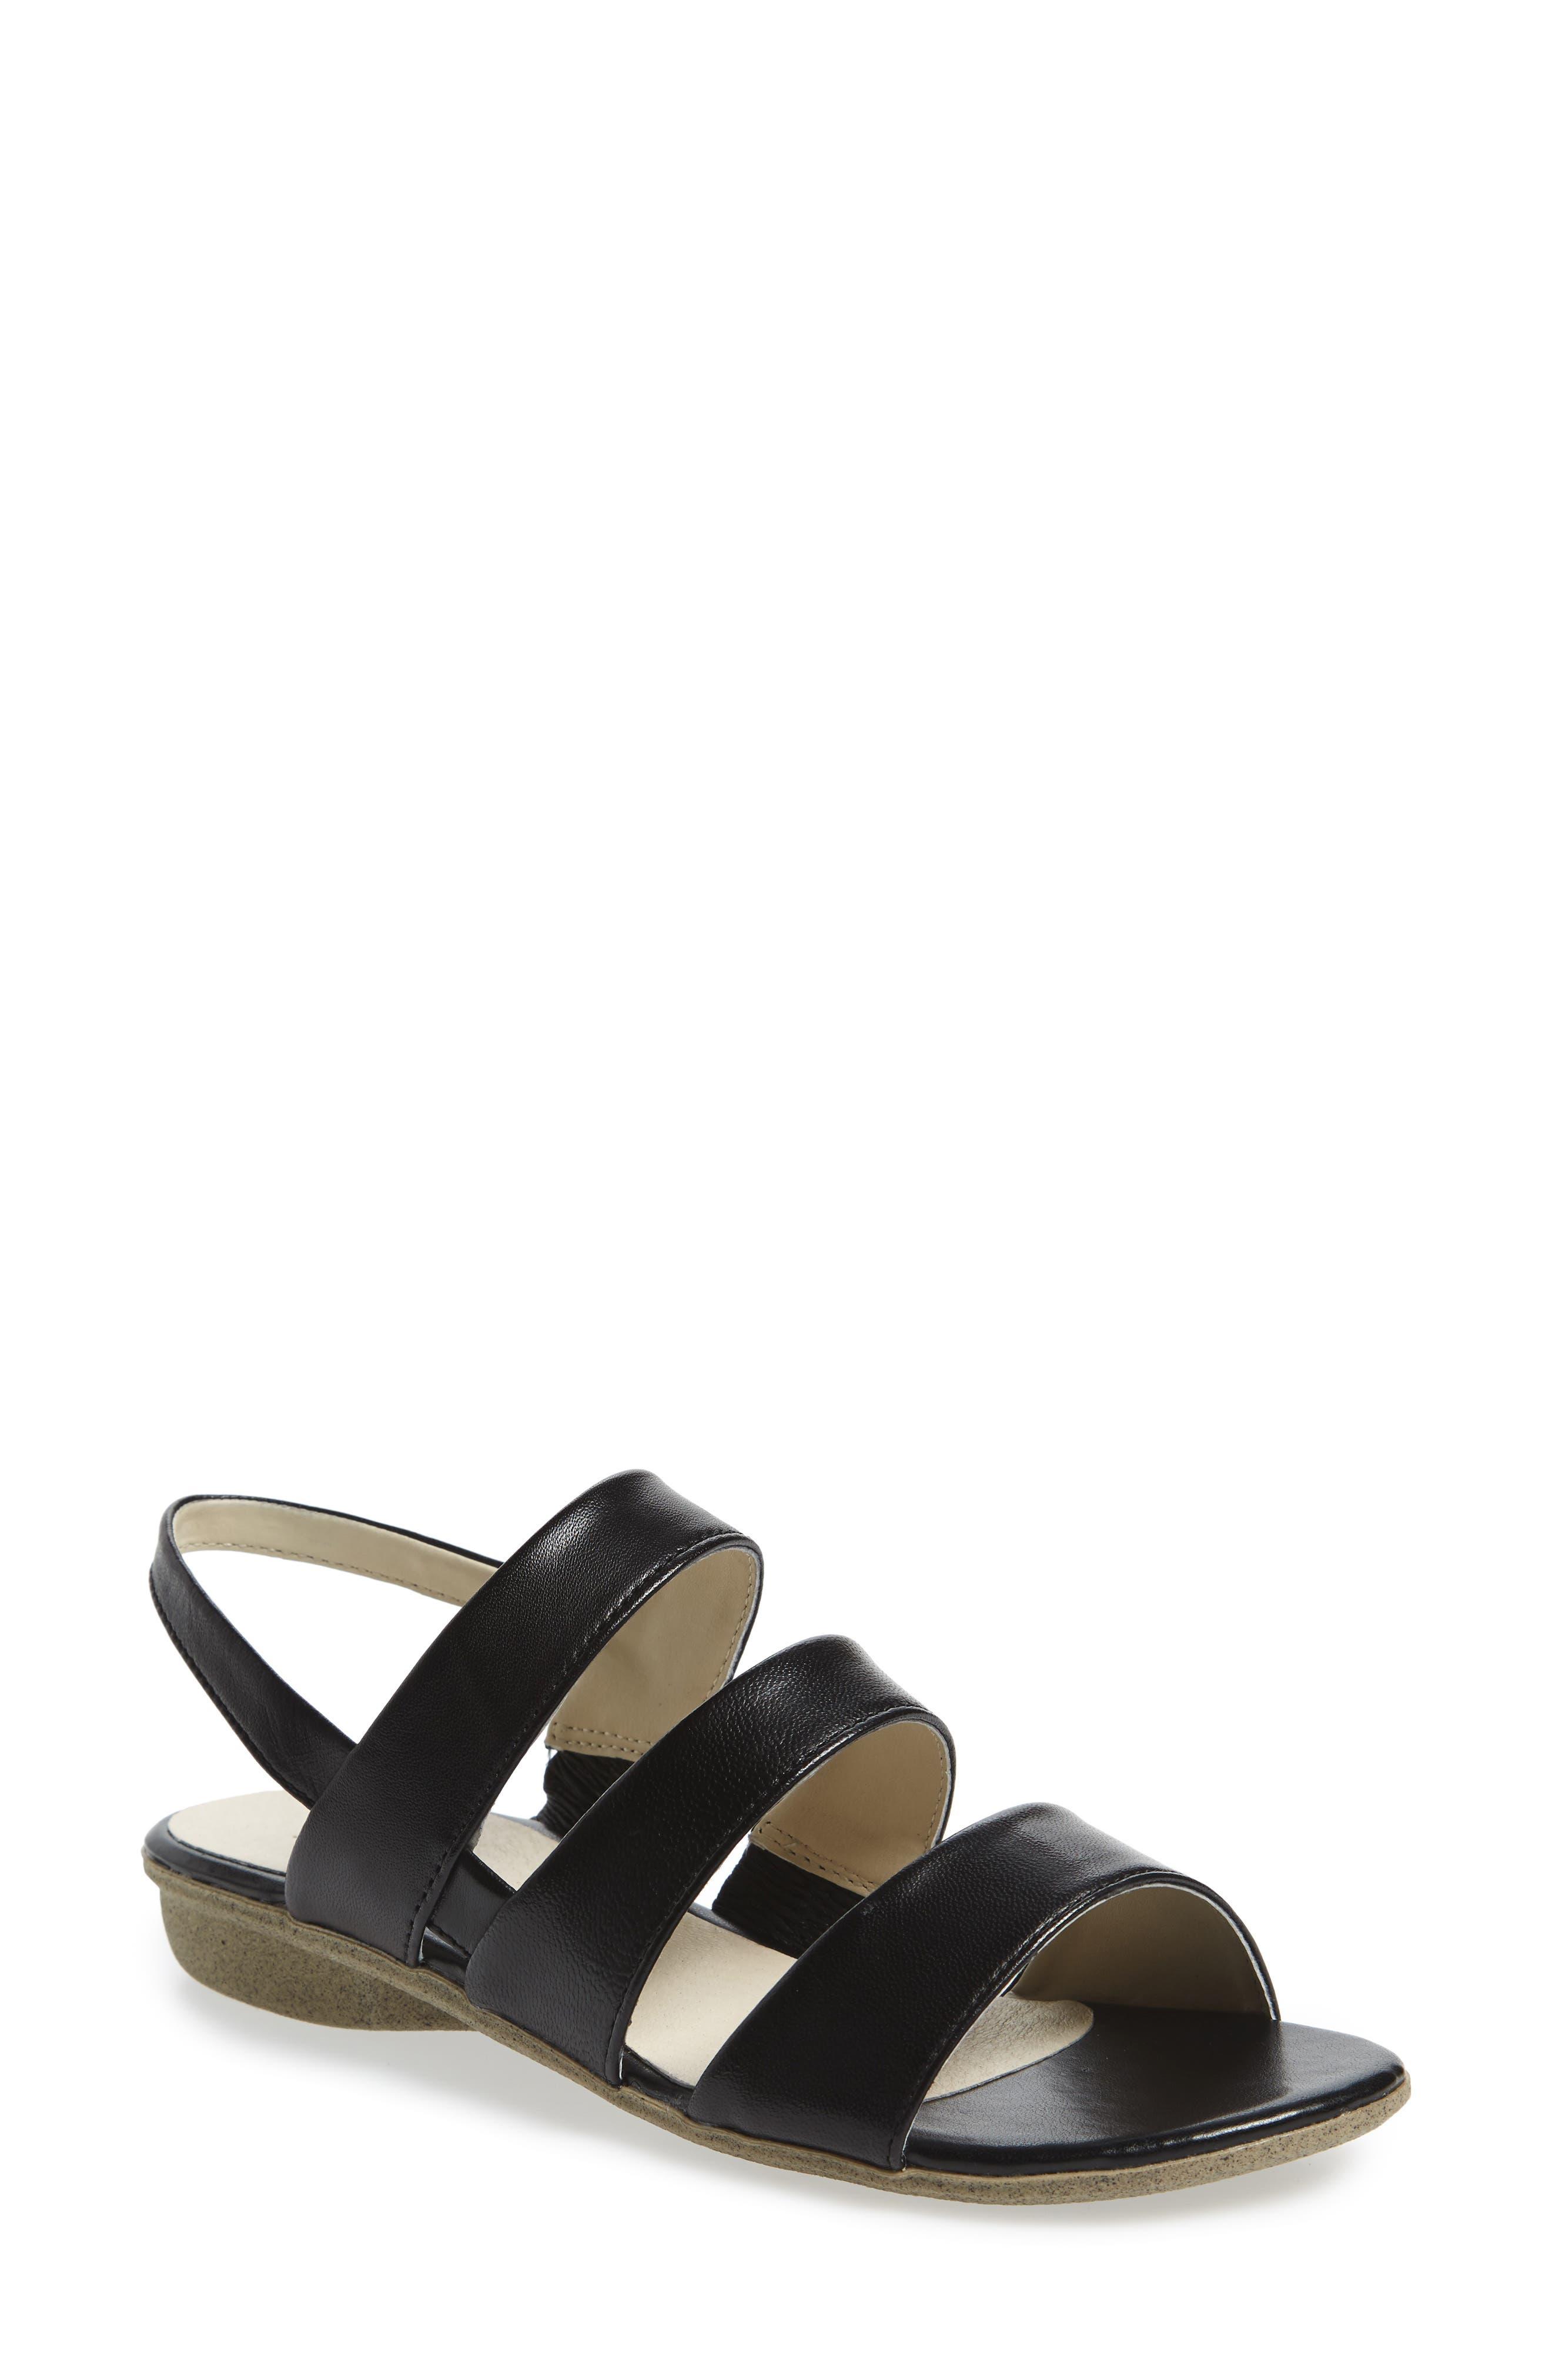 Fabia 11 Sandal,                         Main,                         color, 008